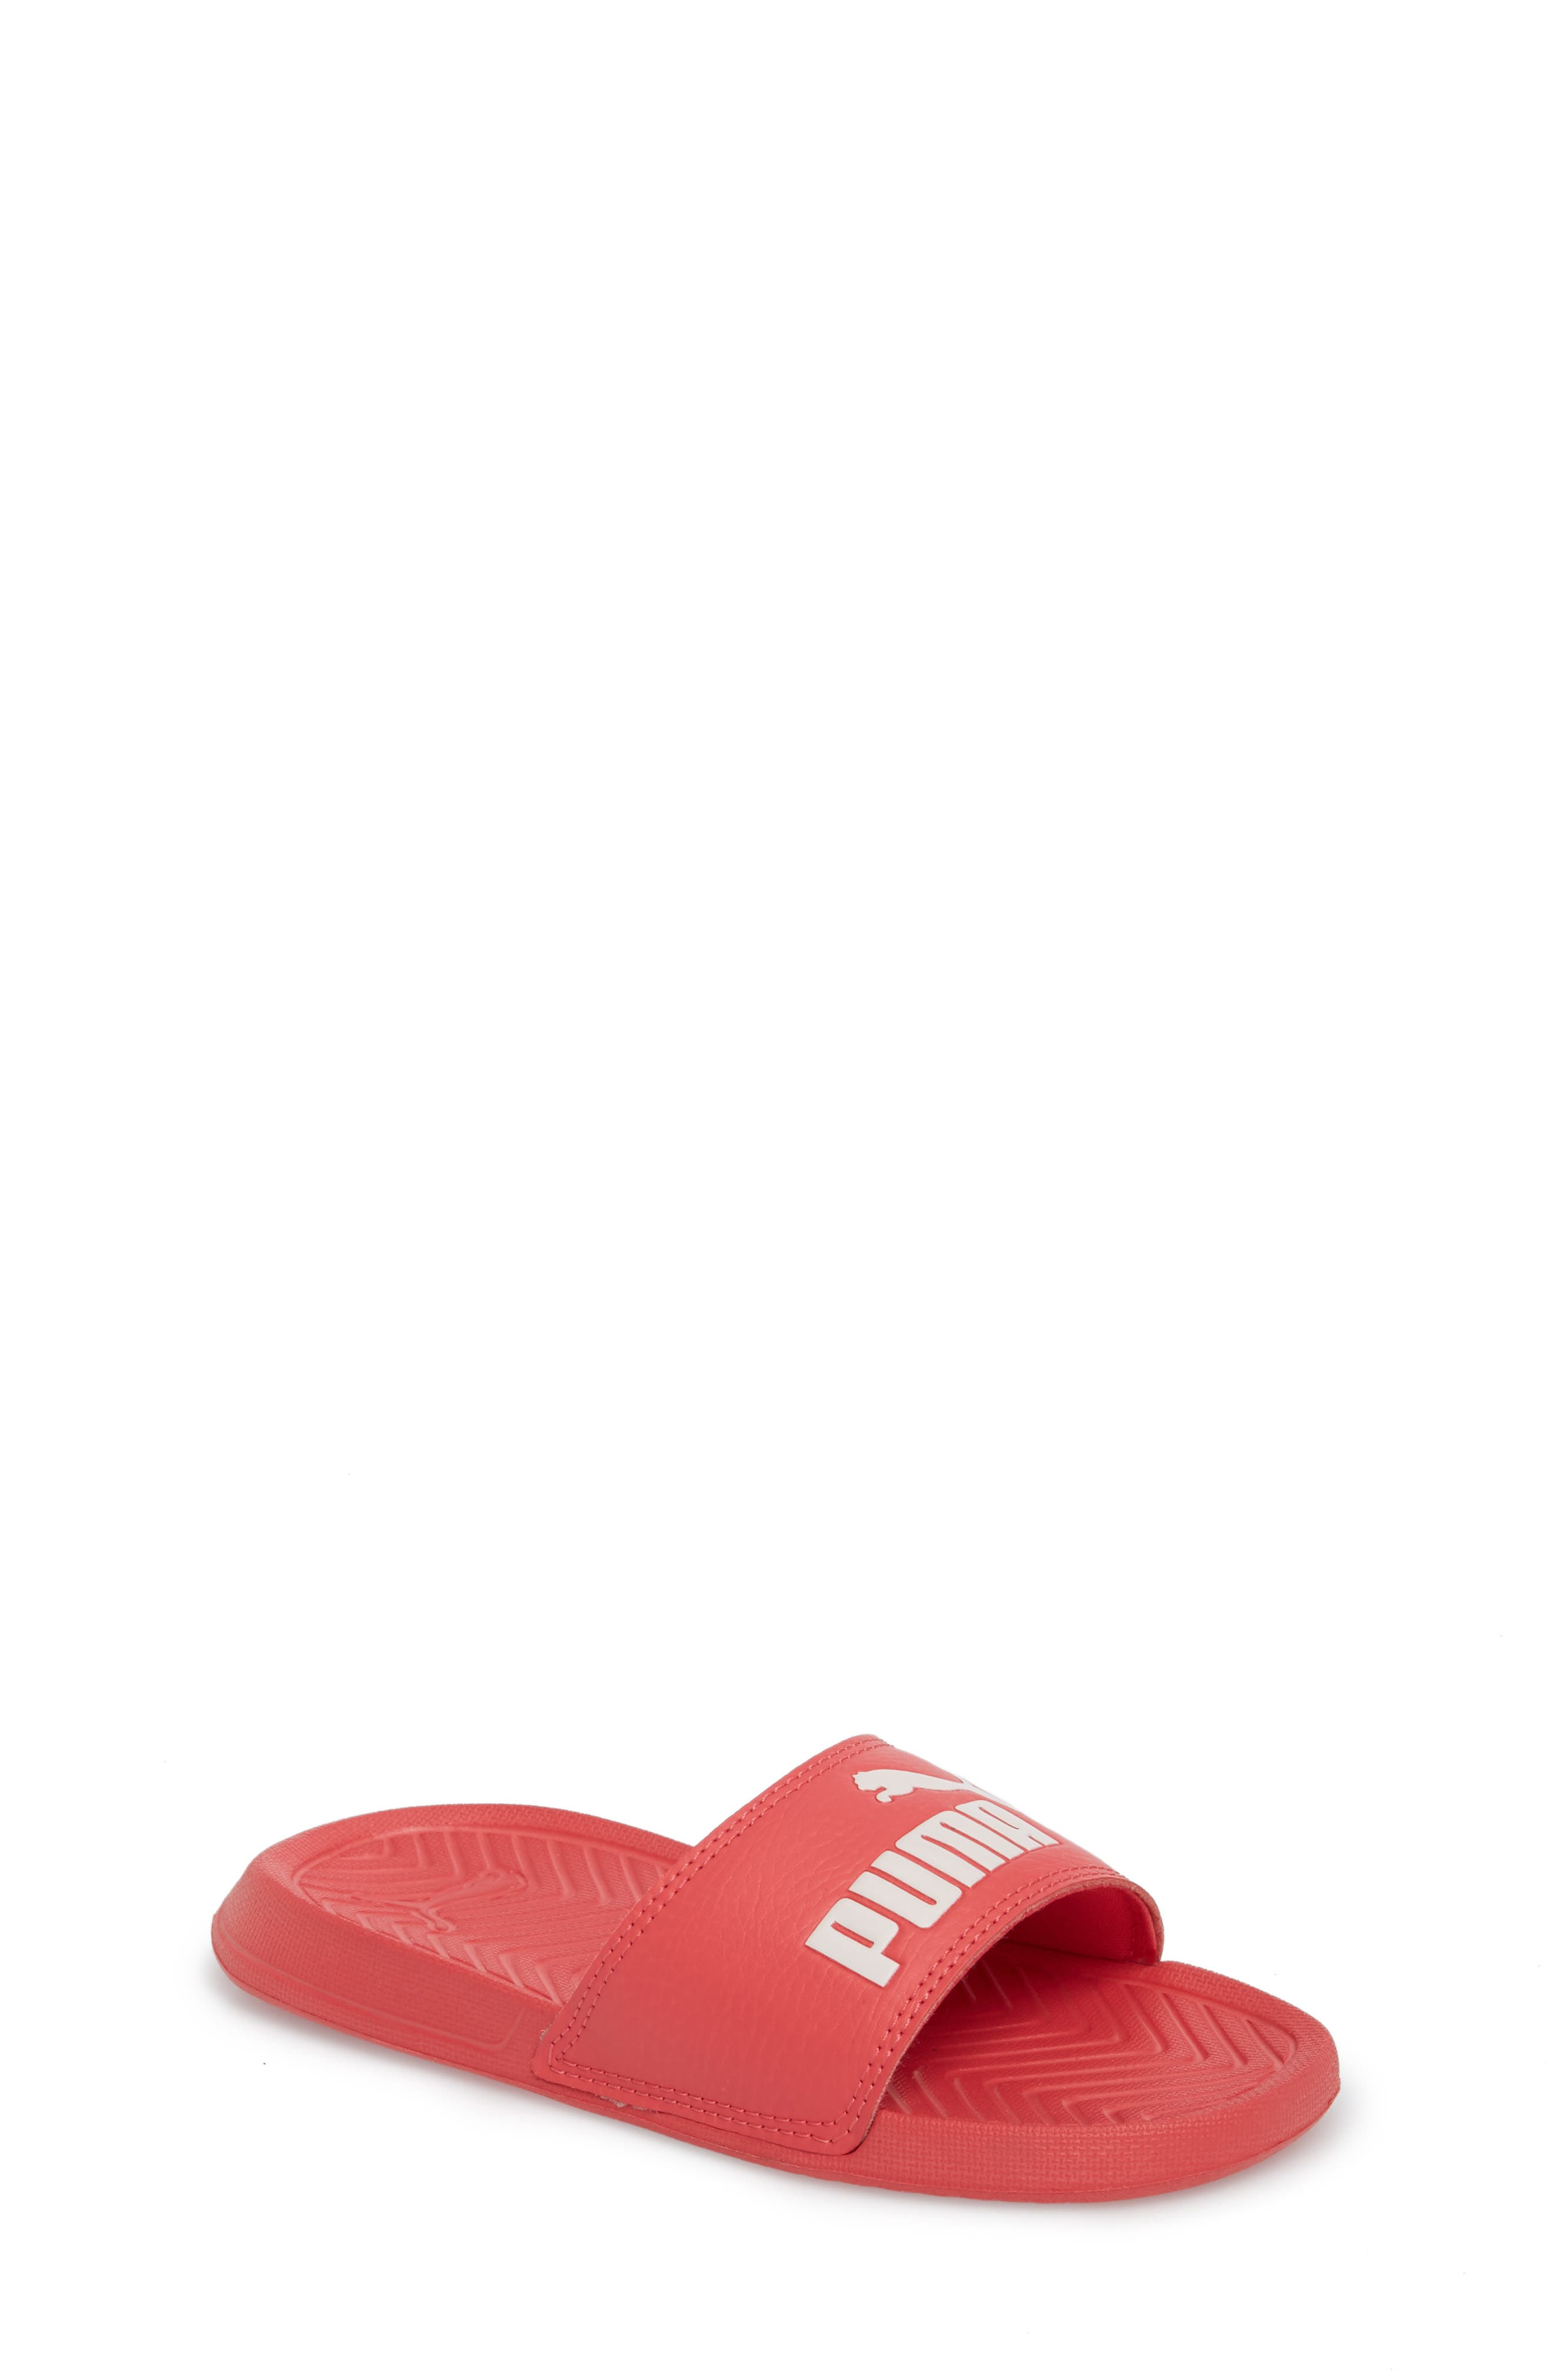 Popcat Slide Sandal,                             Main thumbnail 1, color,                             Paradise Pink/ Pearl